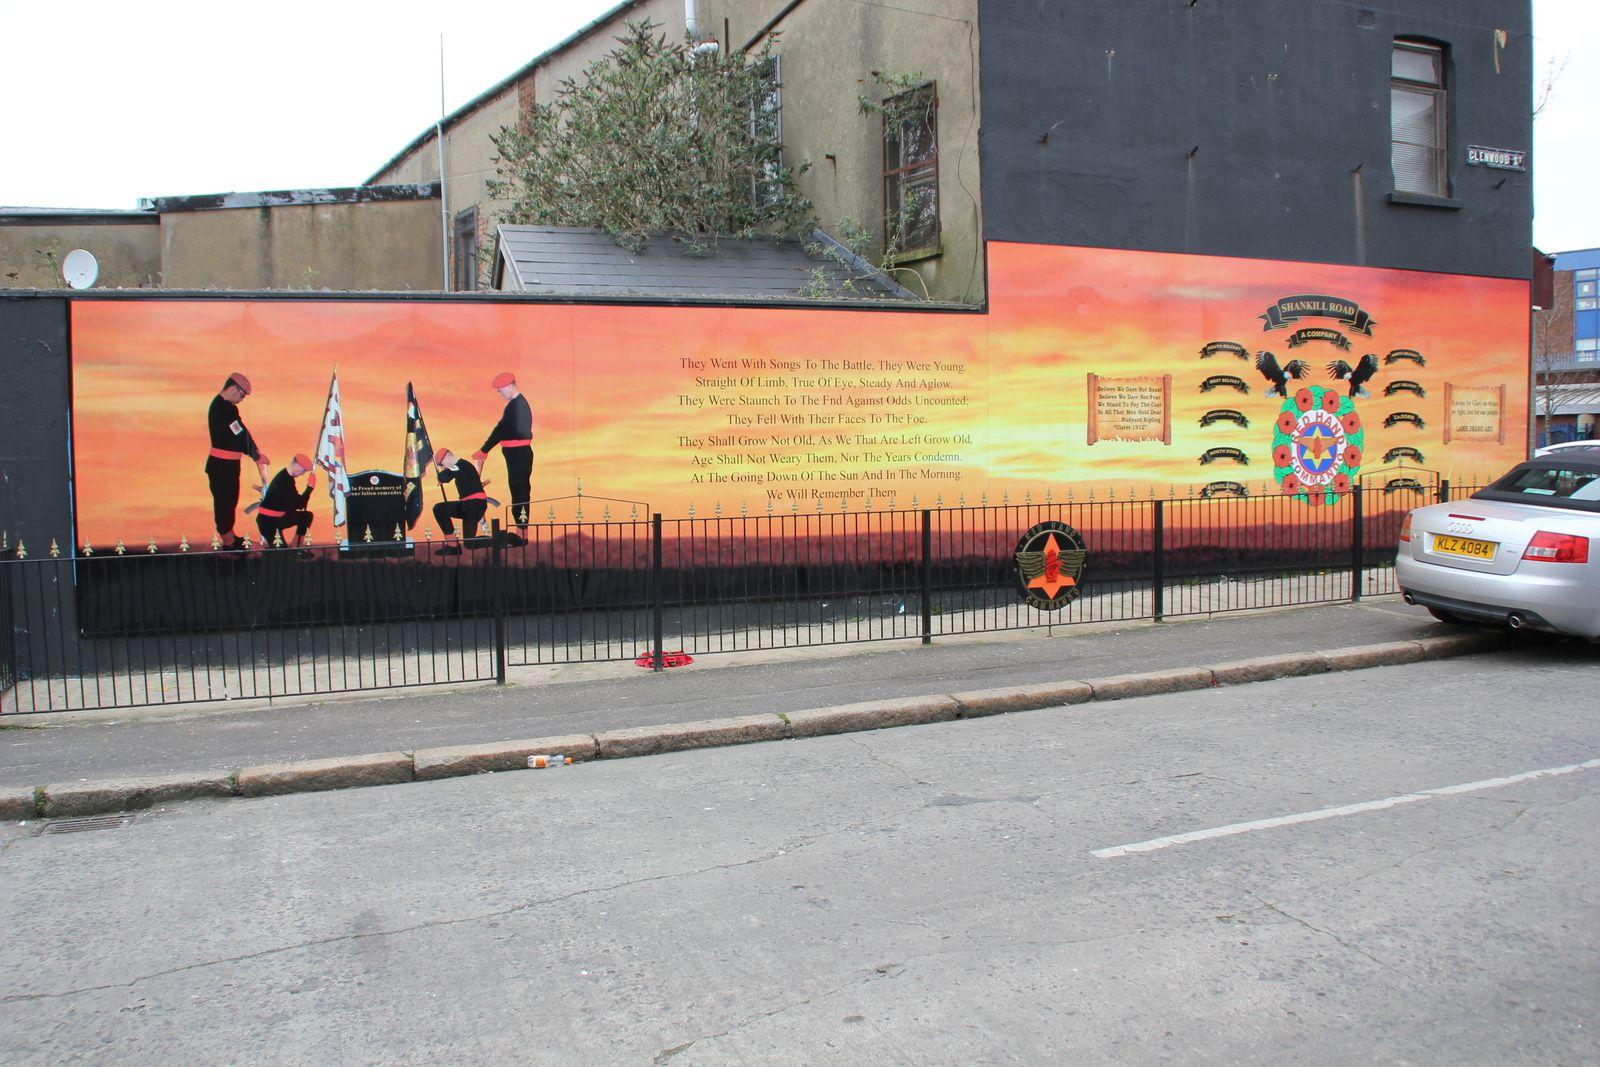 515) Glenwood Street, West Belfast